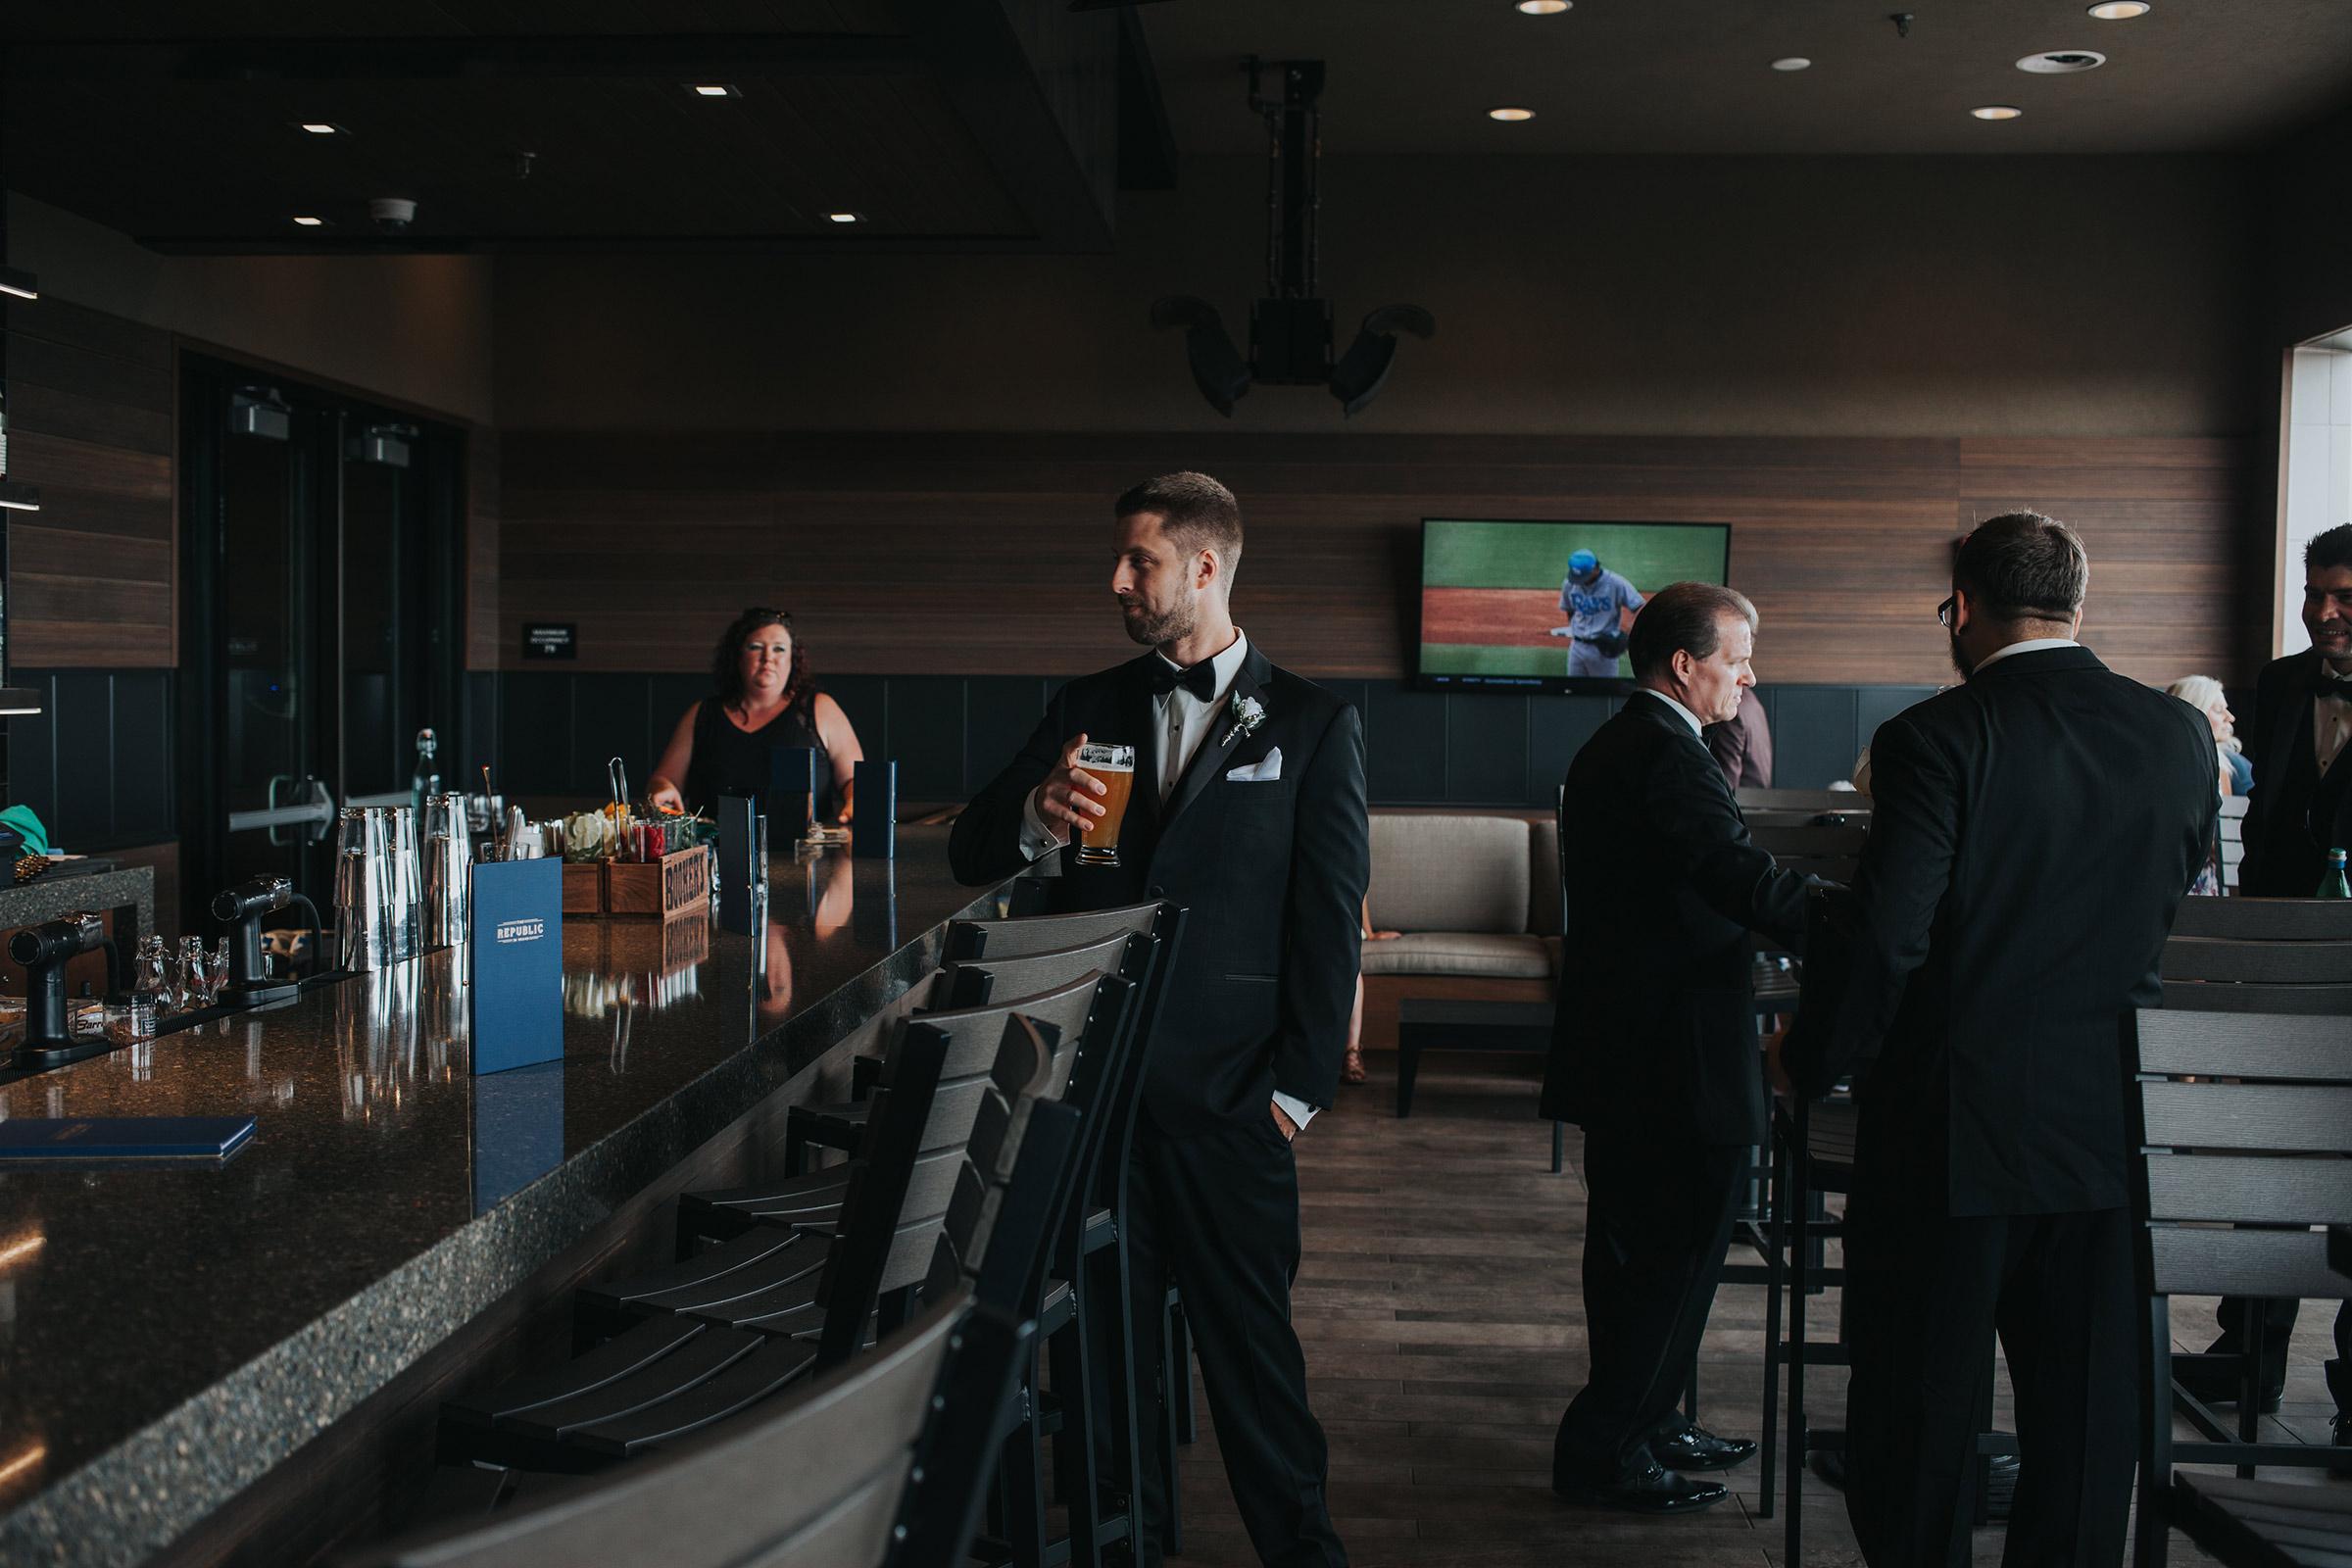 groomsmen-ording-drink-at-bar-republic-on-grand-desmoines-iowa-ac-hotel-raelyn-ramey-photography.jpg